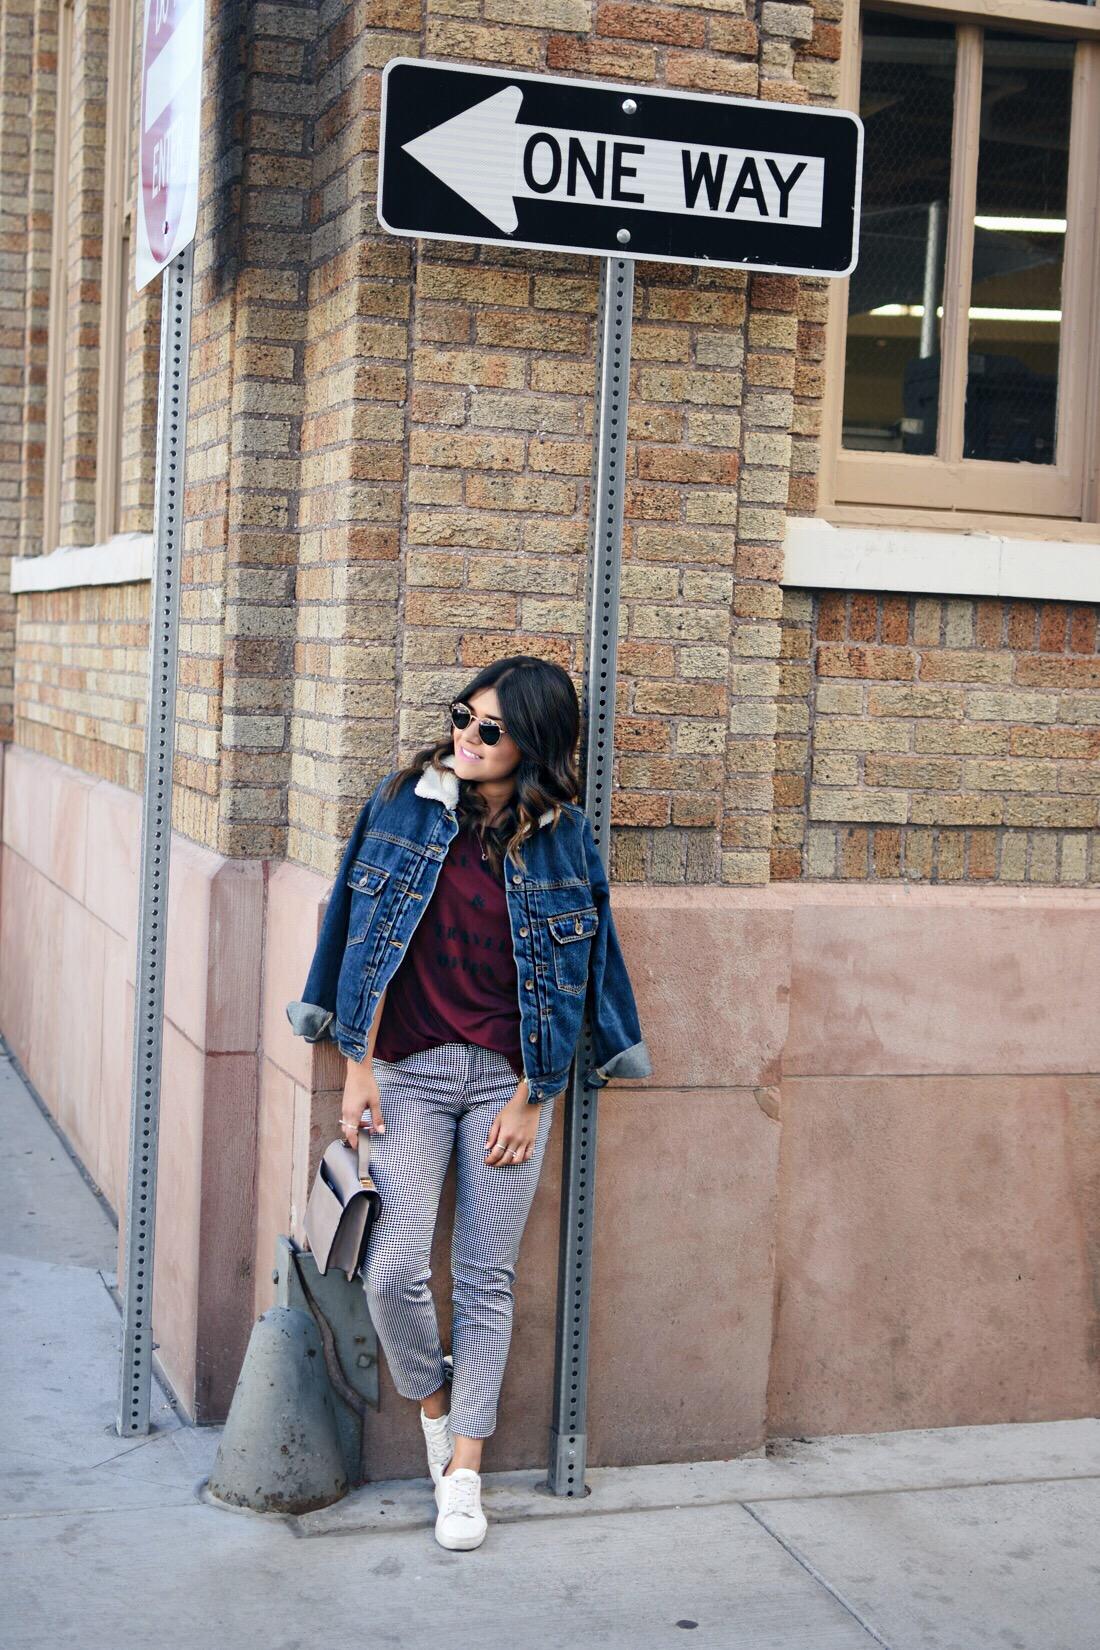 Carolina Hellal of Chic Talk wearing an Old navy burgundy T, denim jacket, printed pinxie pants, and Rayban rounded sunglasses